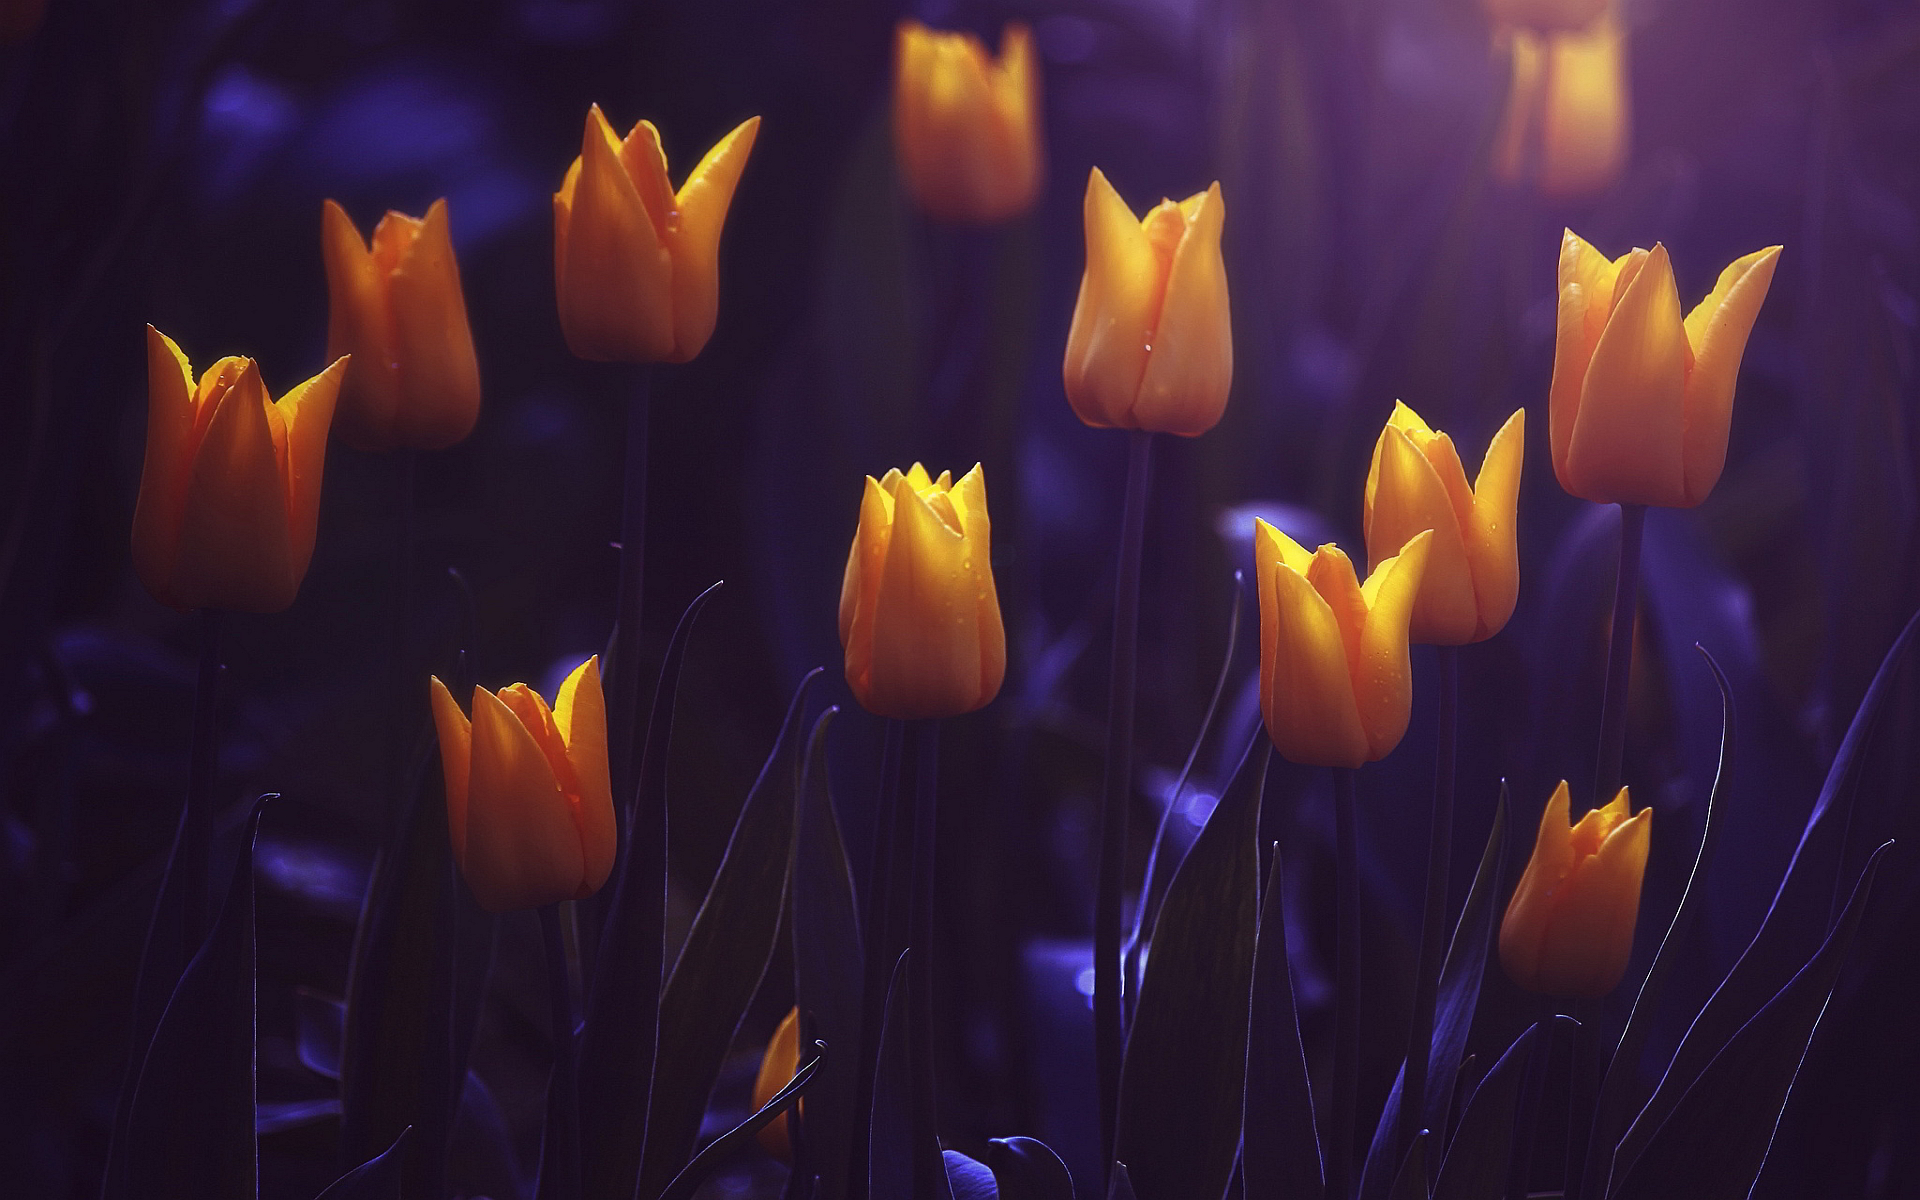 Shining yellow tulips